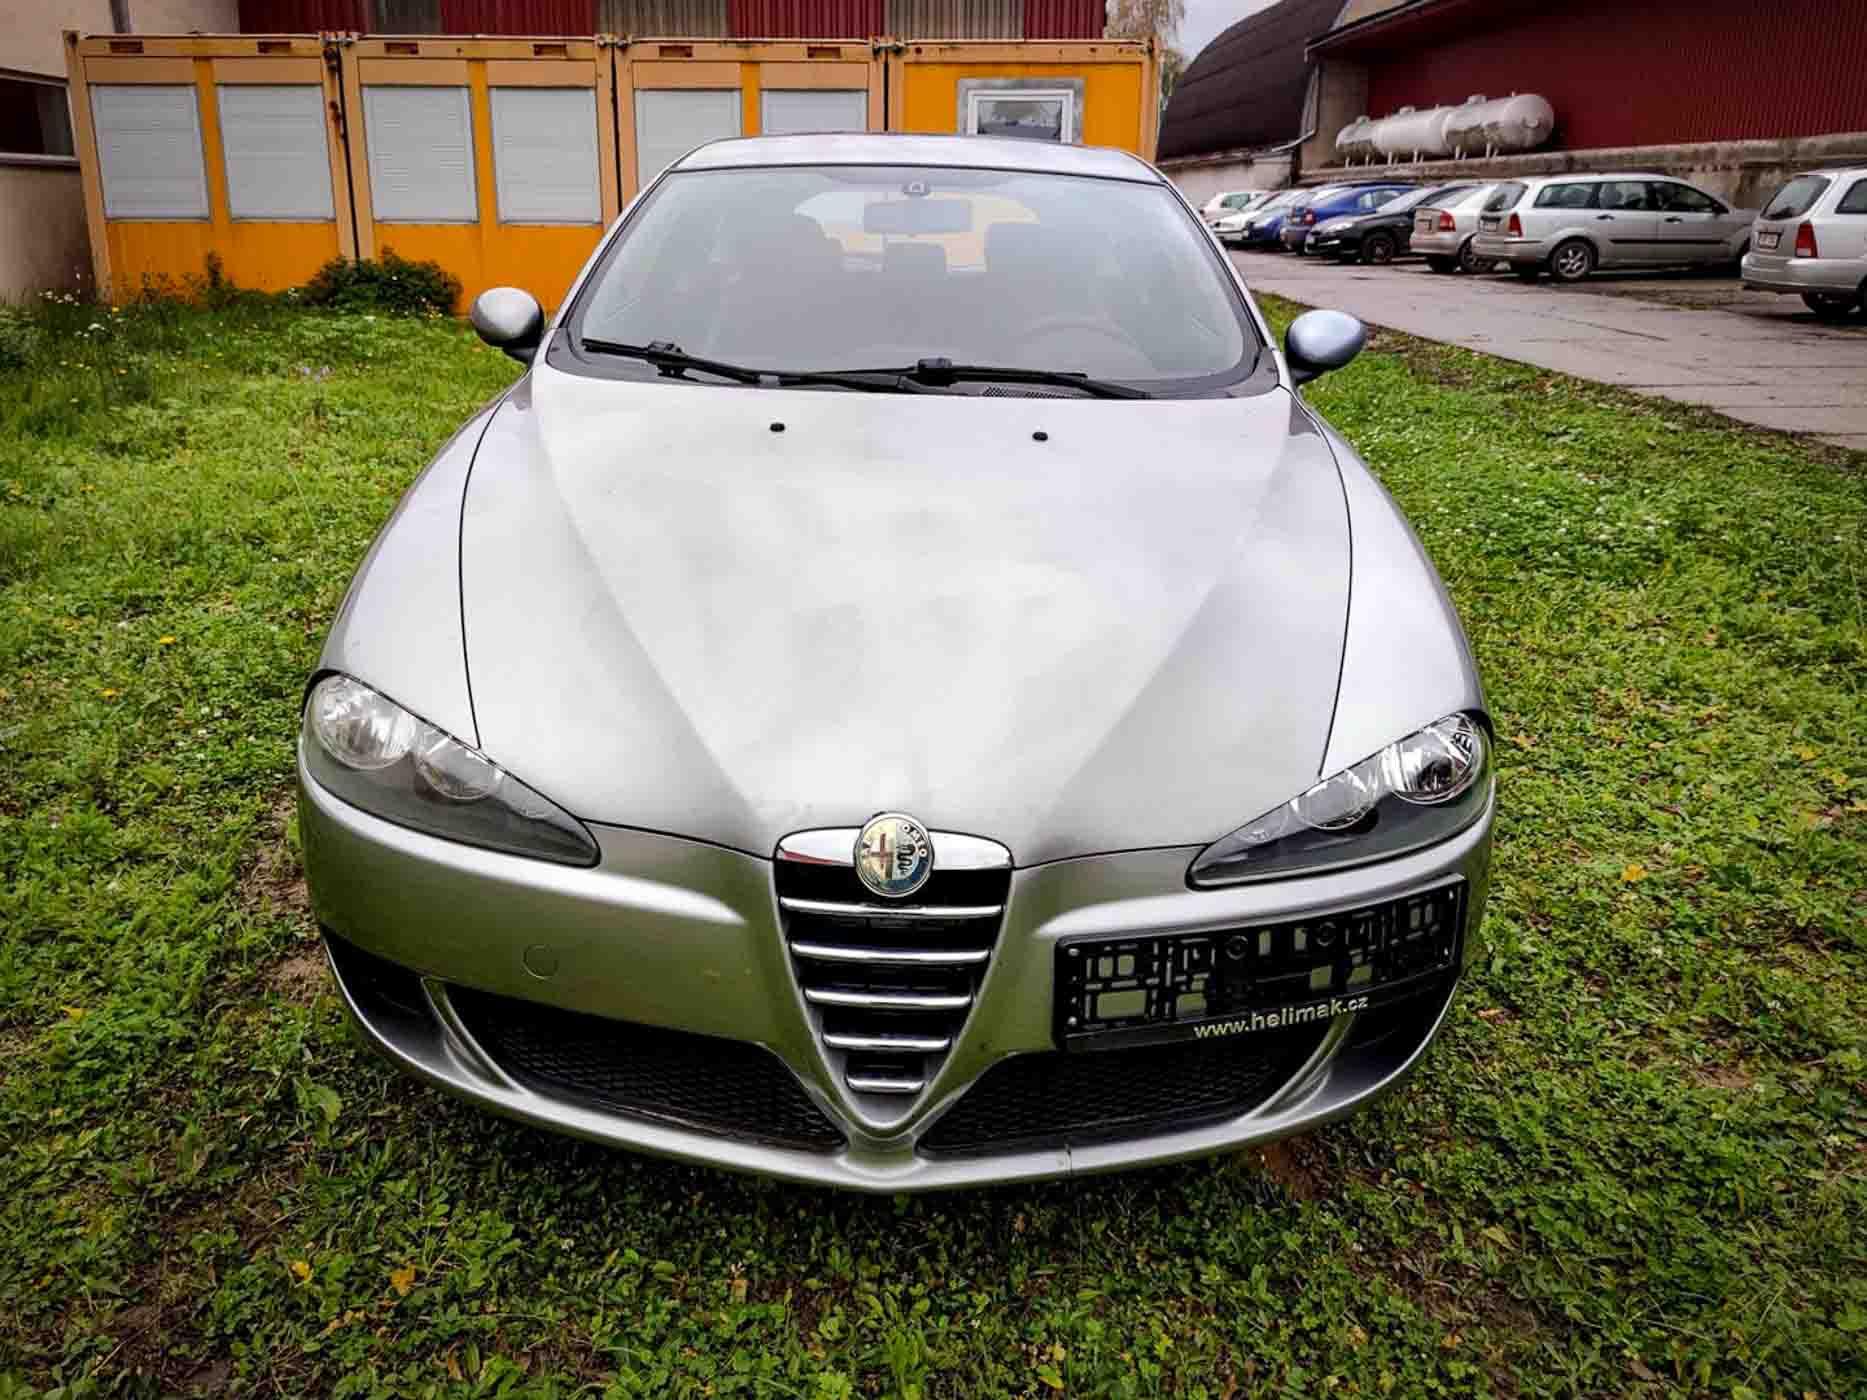 Alfa Romeo 147 1.6 16v 77kW 3dv